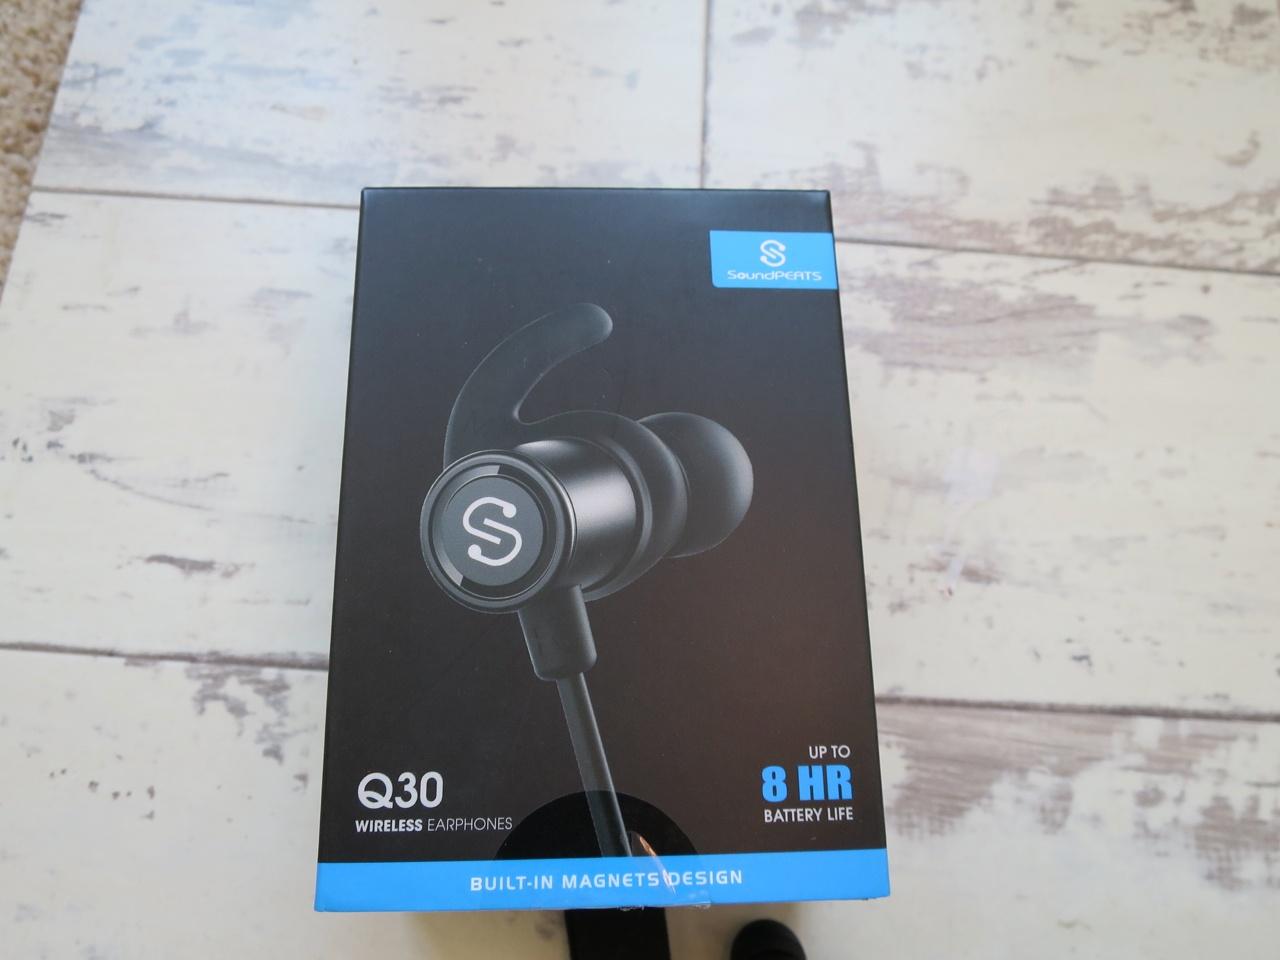 Soundpeats Q30 bluetooth earphones box